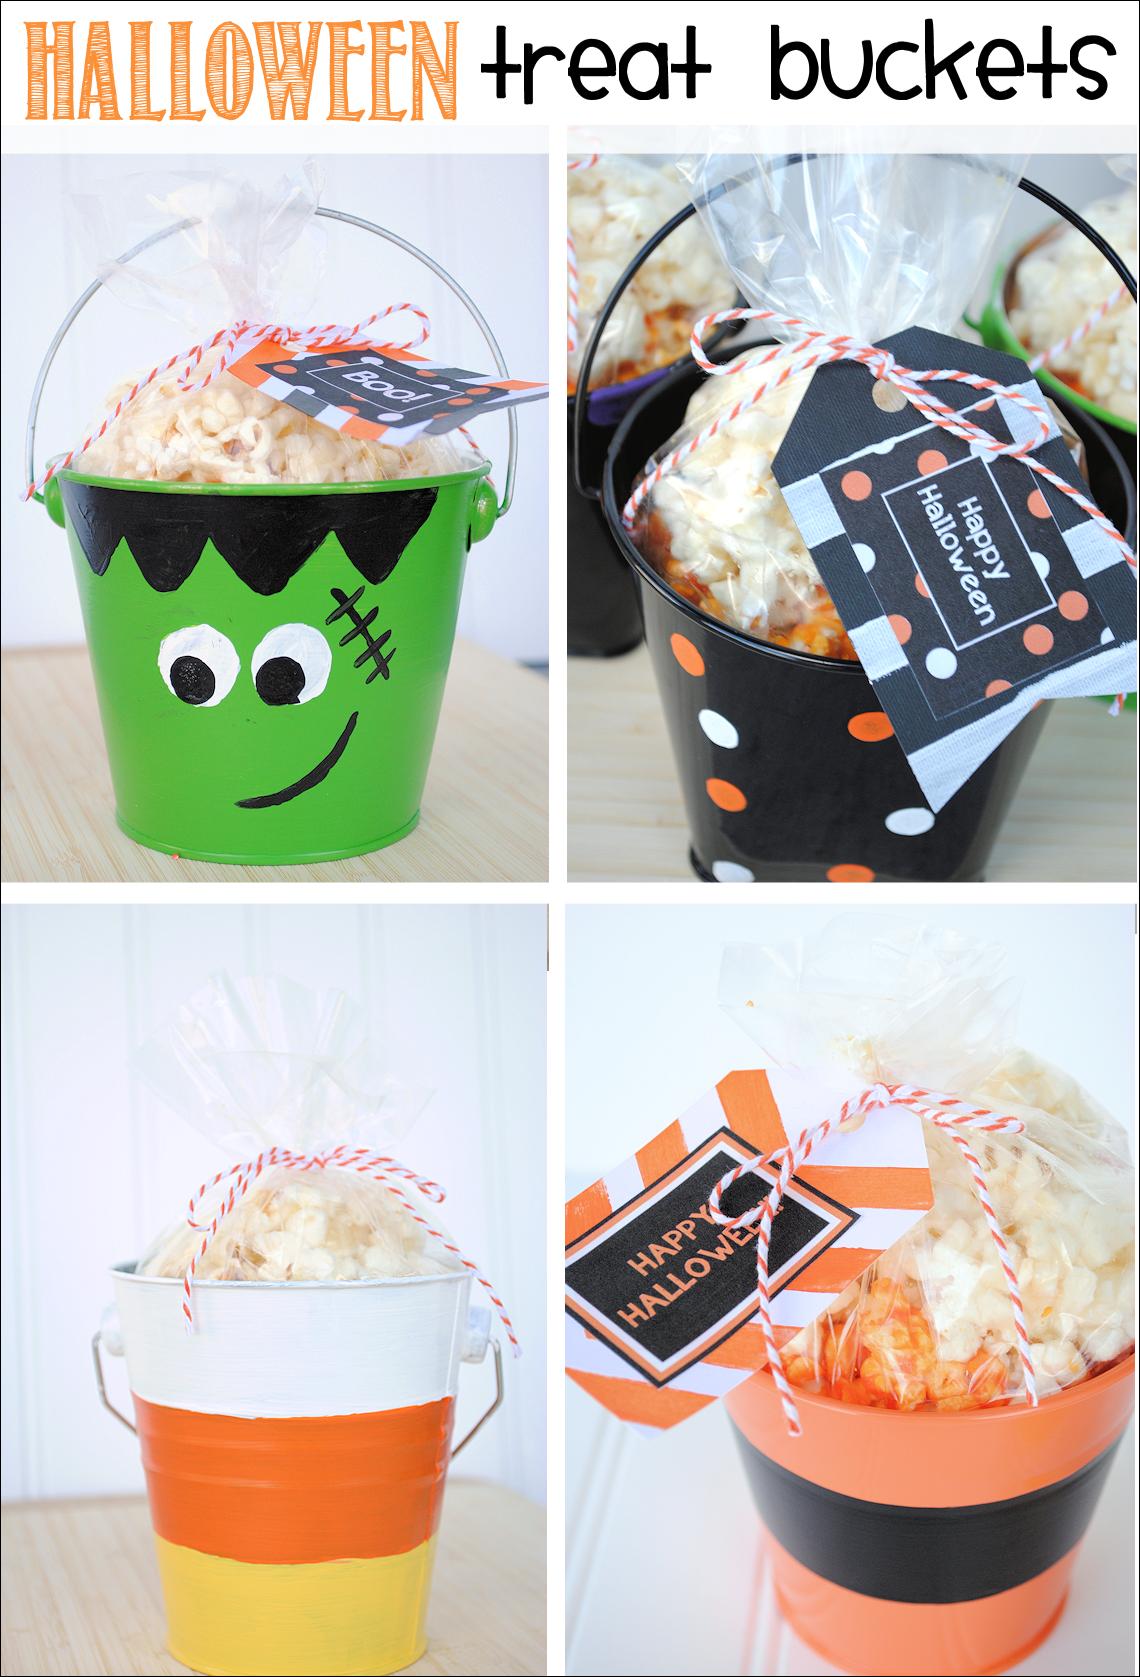 Halloween treat buckets printable halloween gift tags halloween treat buckets free printable halloween gift tags negle Gallery